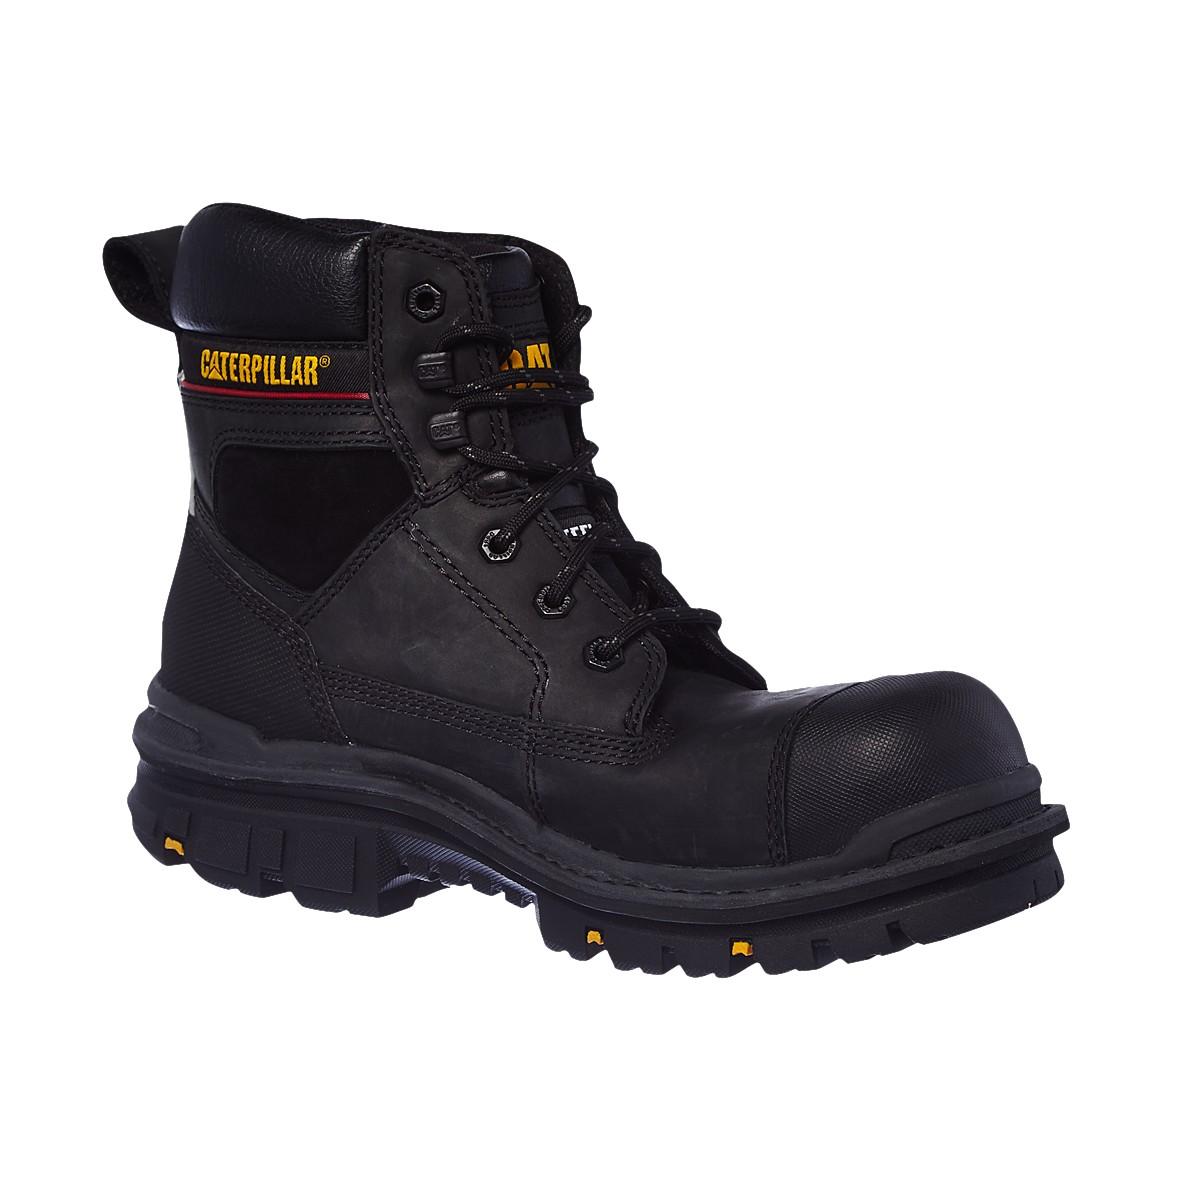 Mens Caterpillar Gravel Steel Toe Cap Safety Boots CAT Heavy Duty